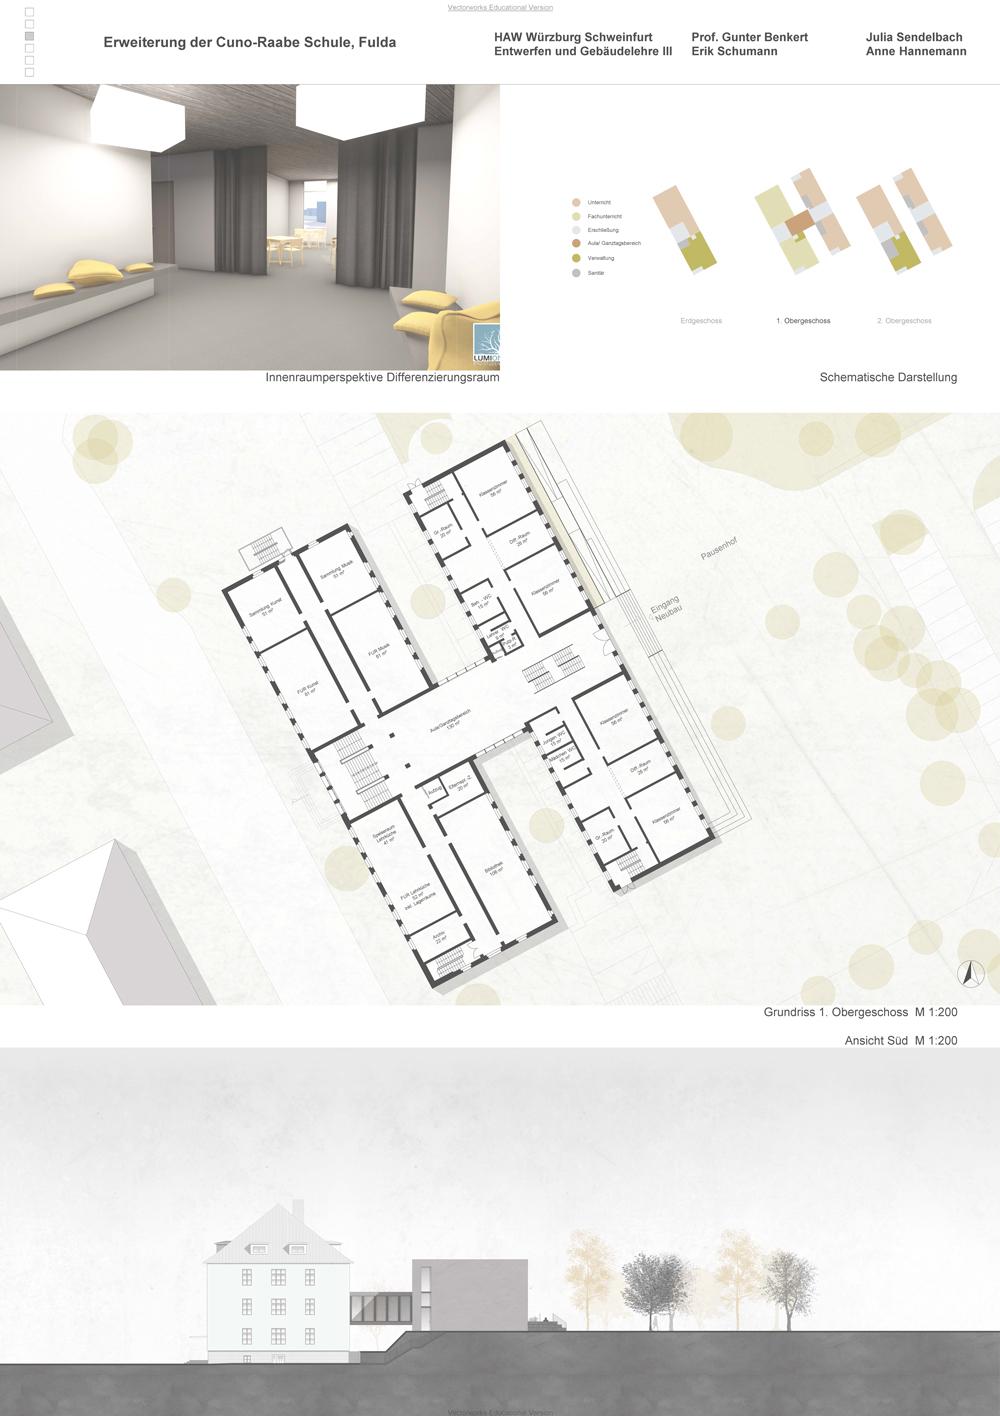 Sendelbach_Hannemann_Plan2